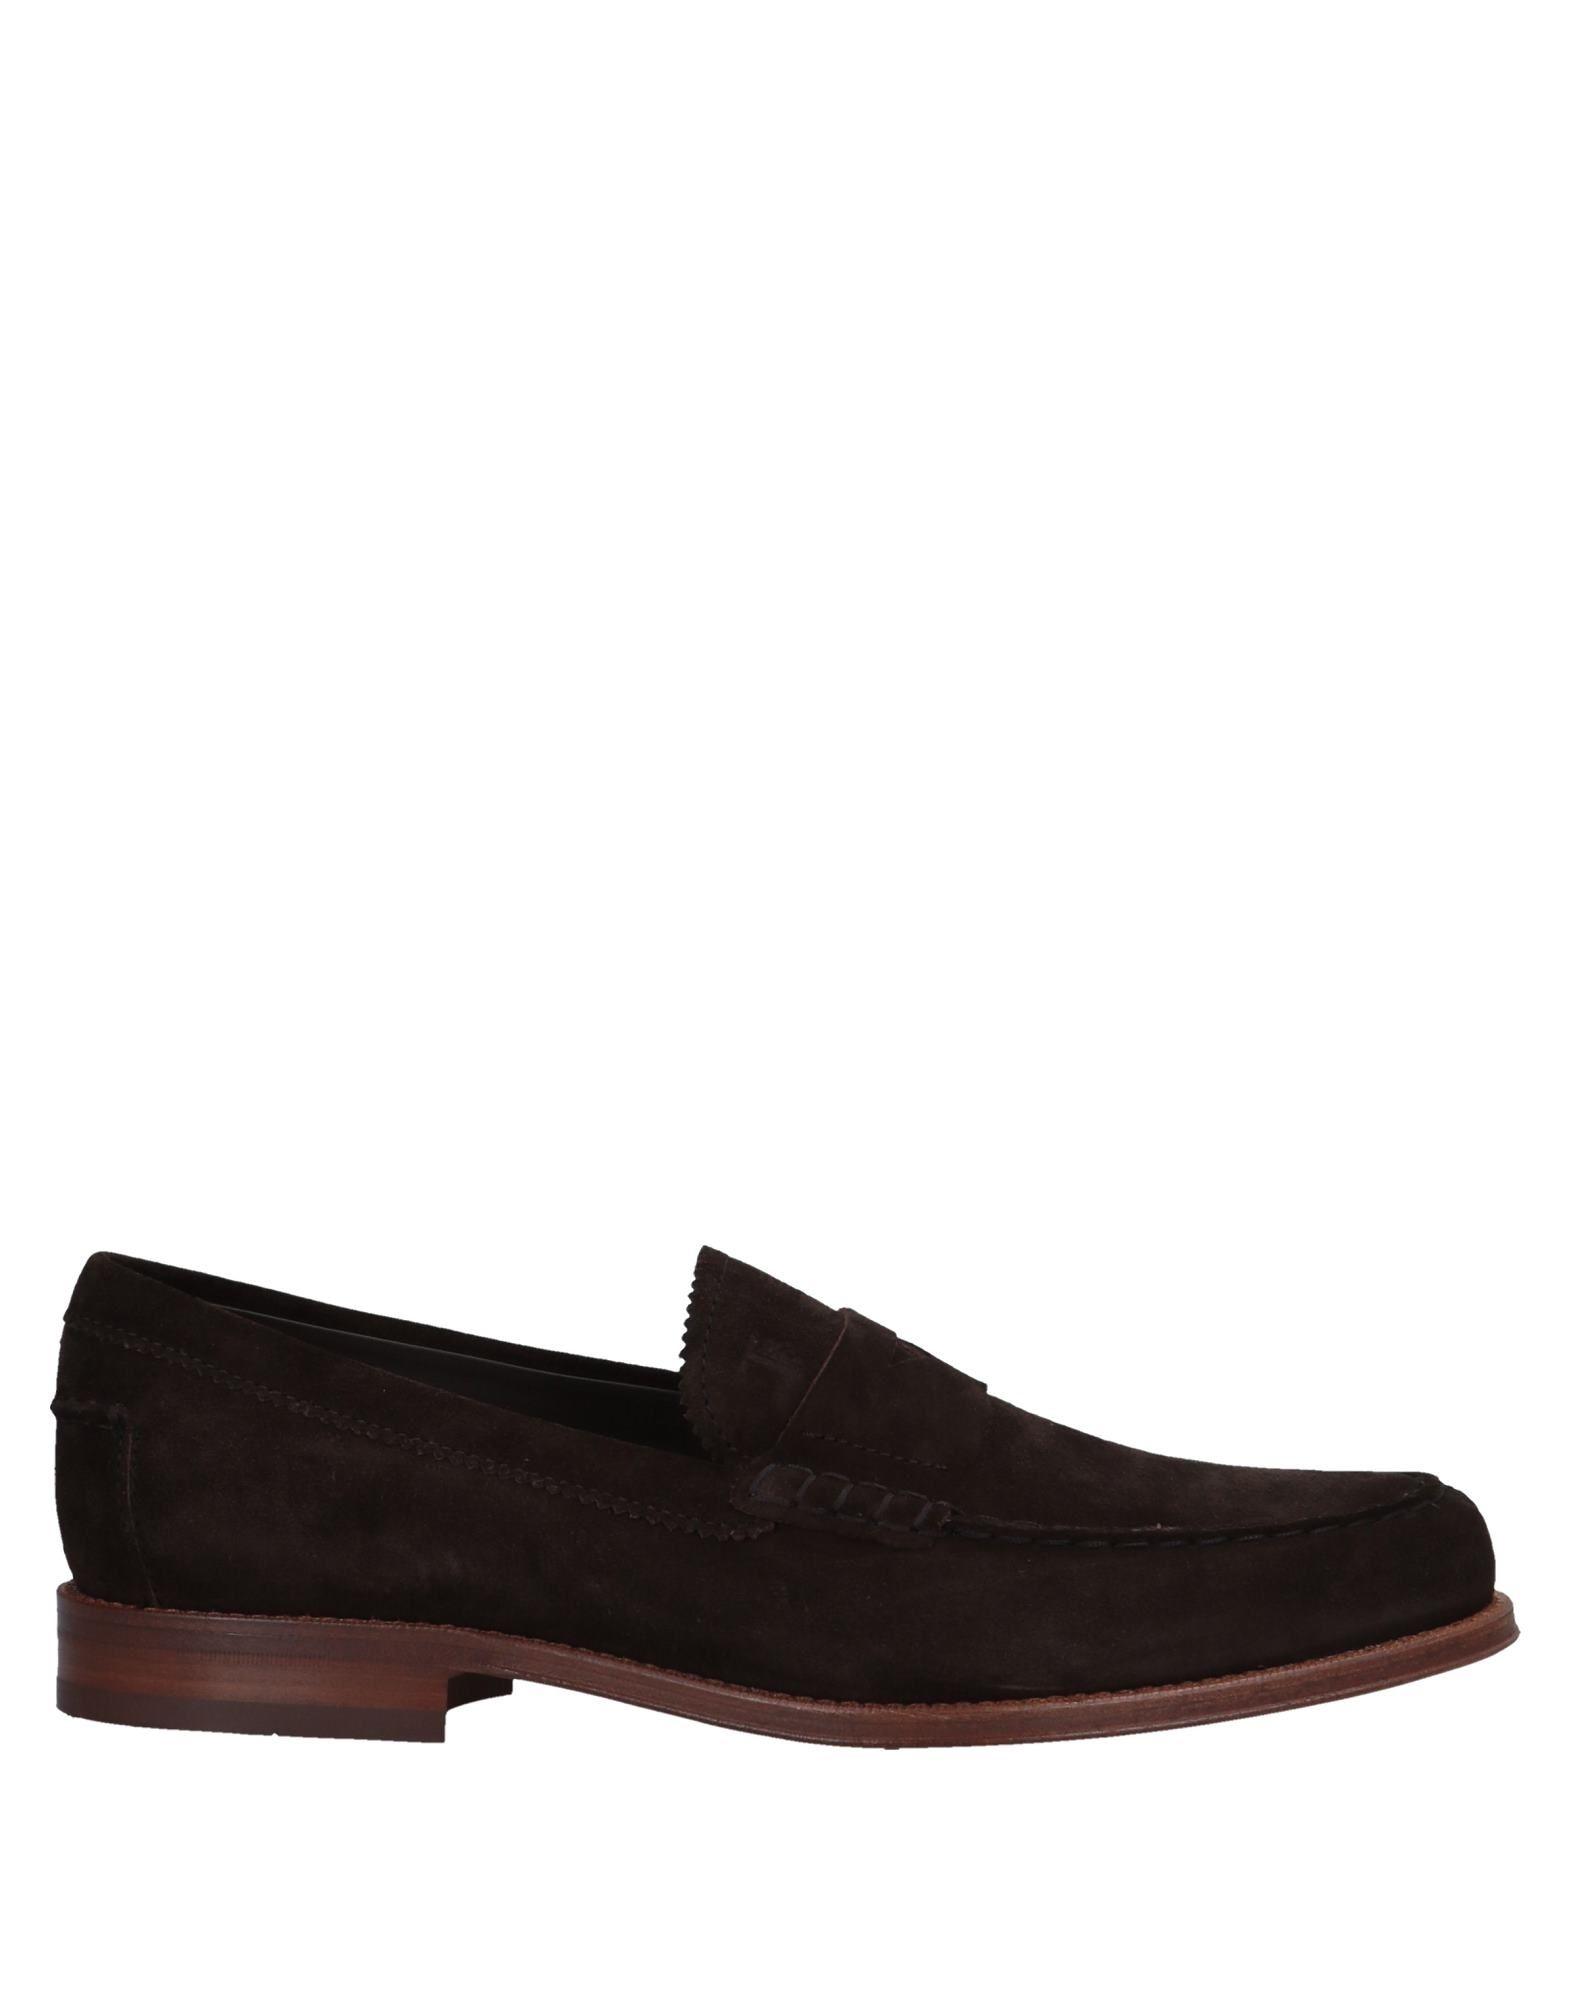 Tod's Mokassins Herren  11541396AK Gute Qualität beliebte Schuhe